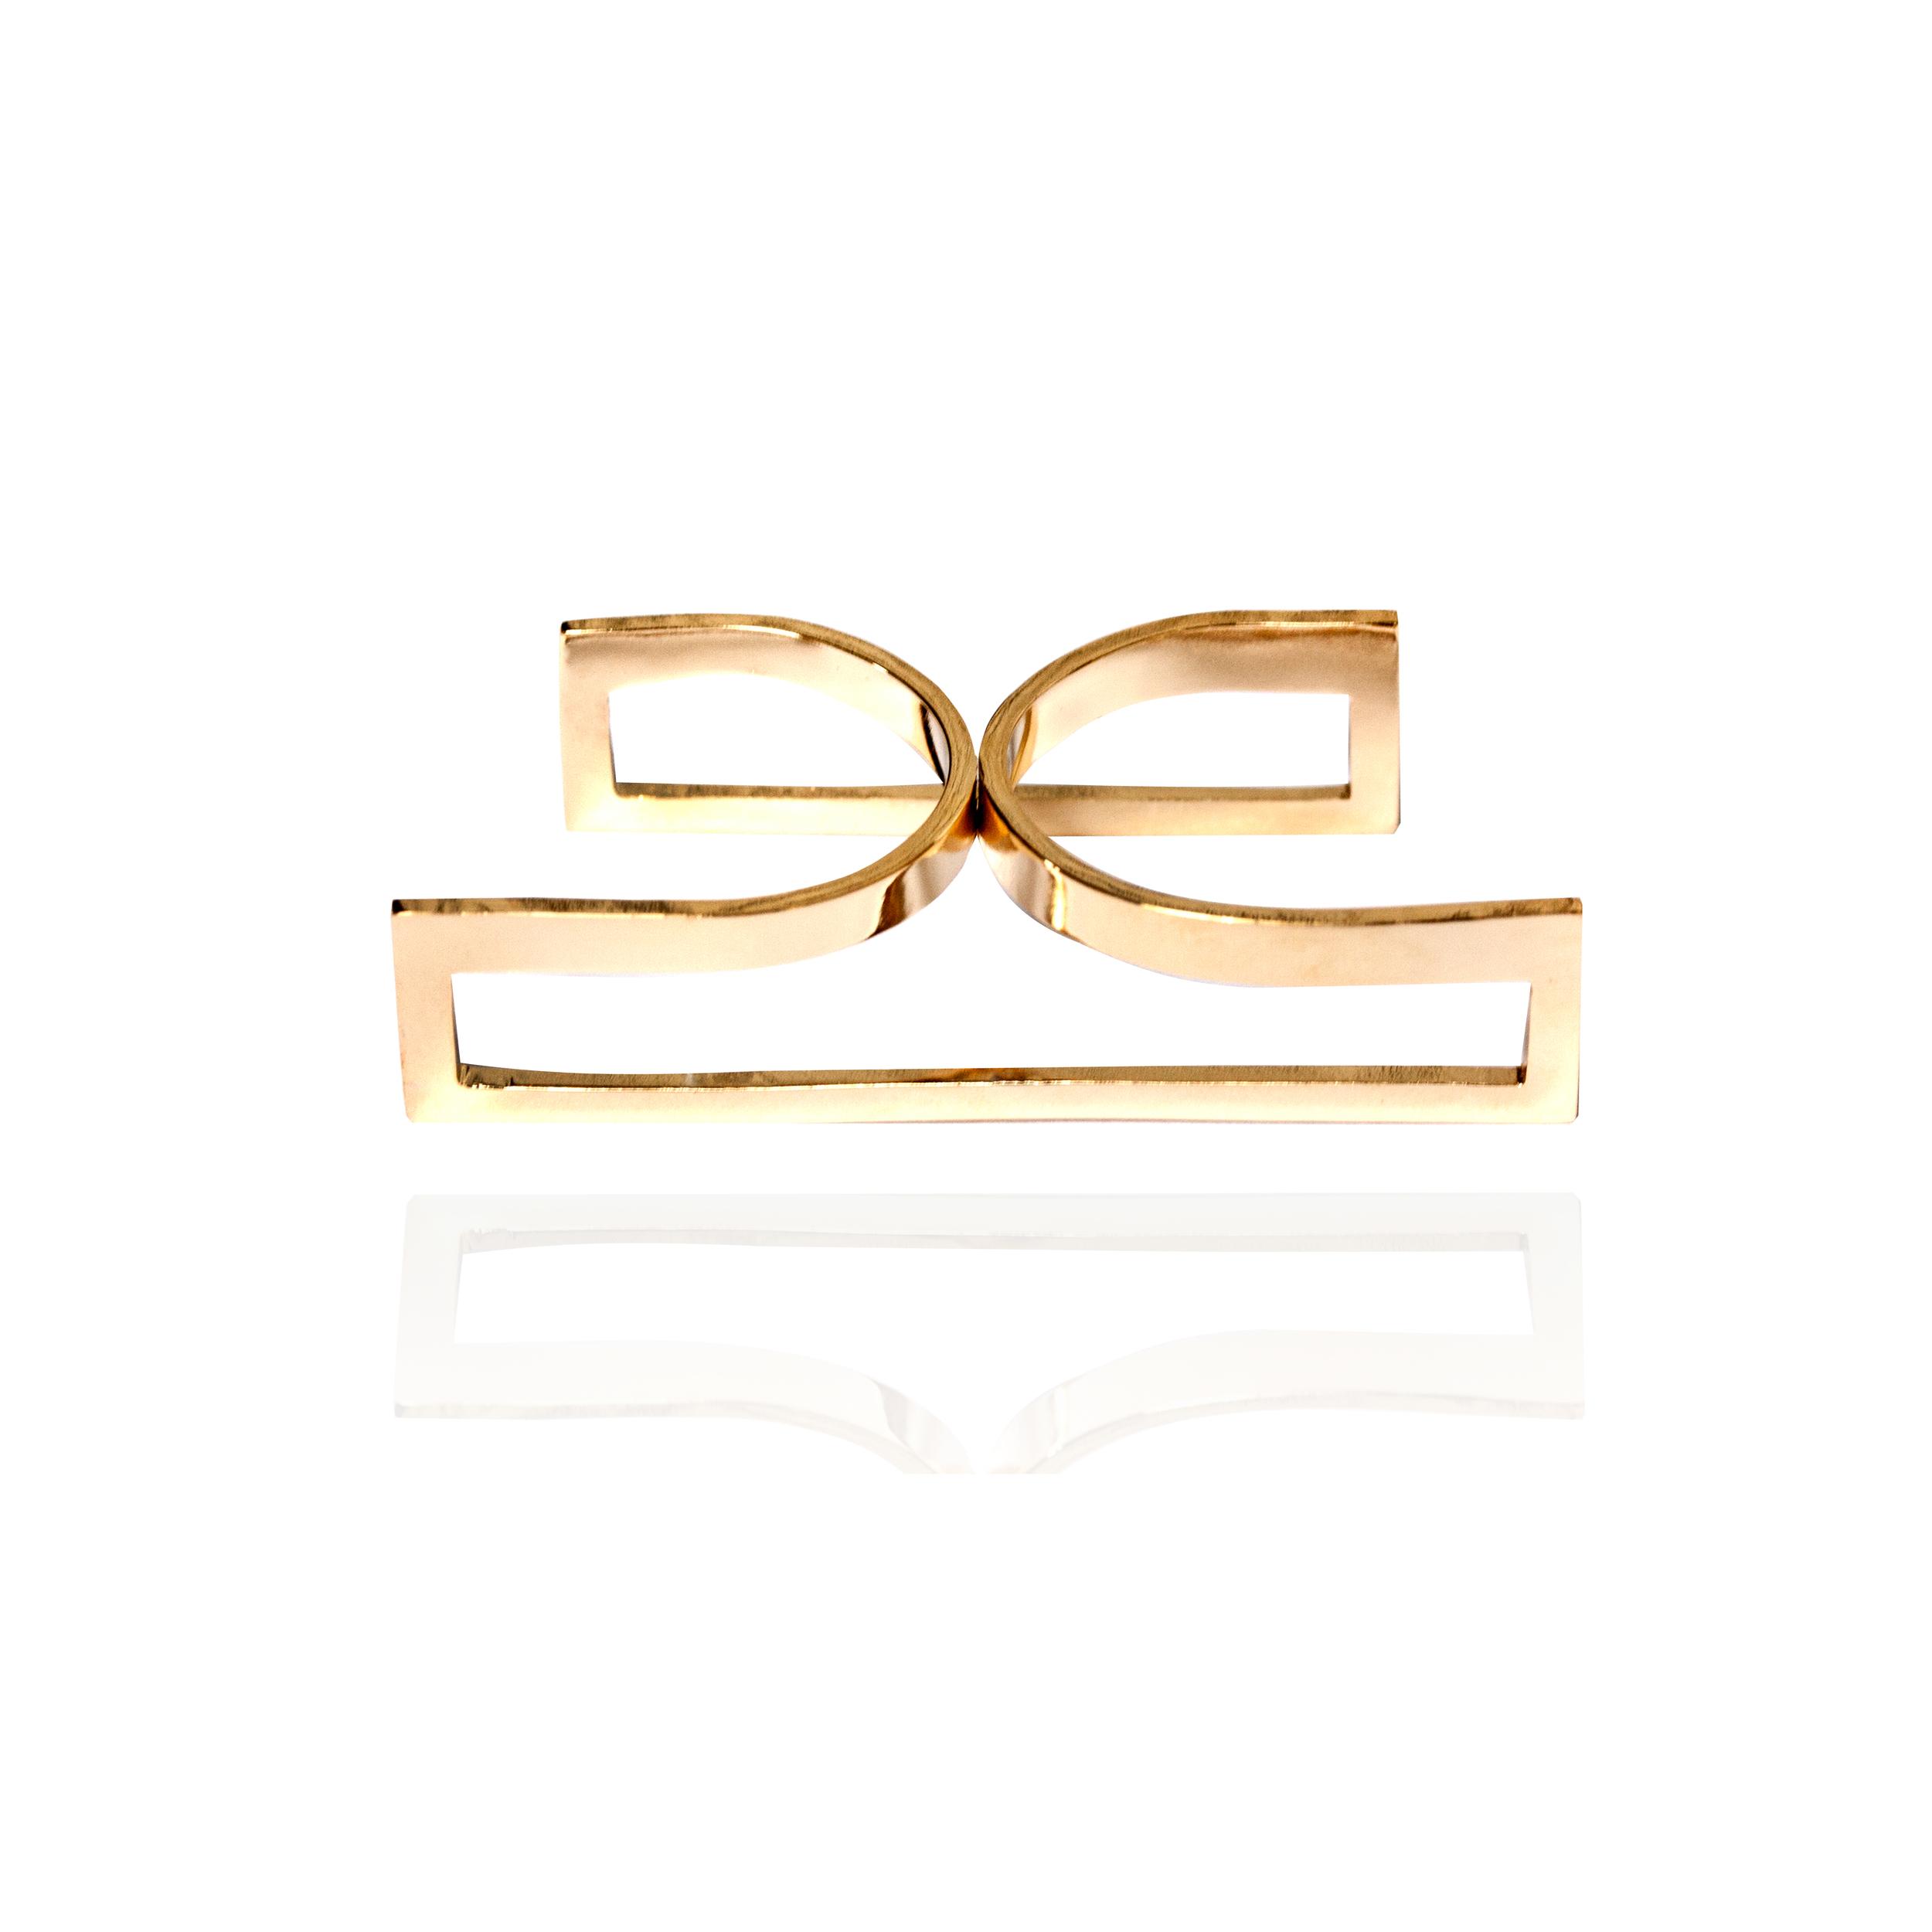 dorry hsu Gold ring by HSU5.jpg